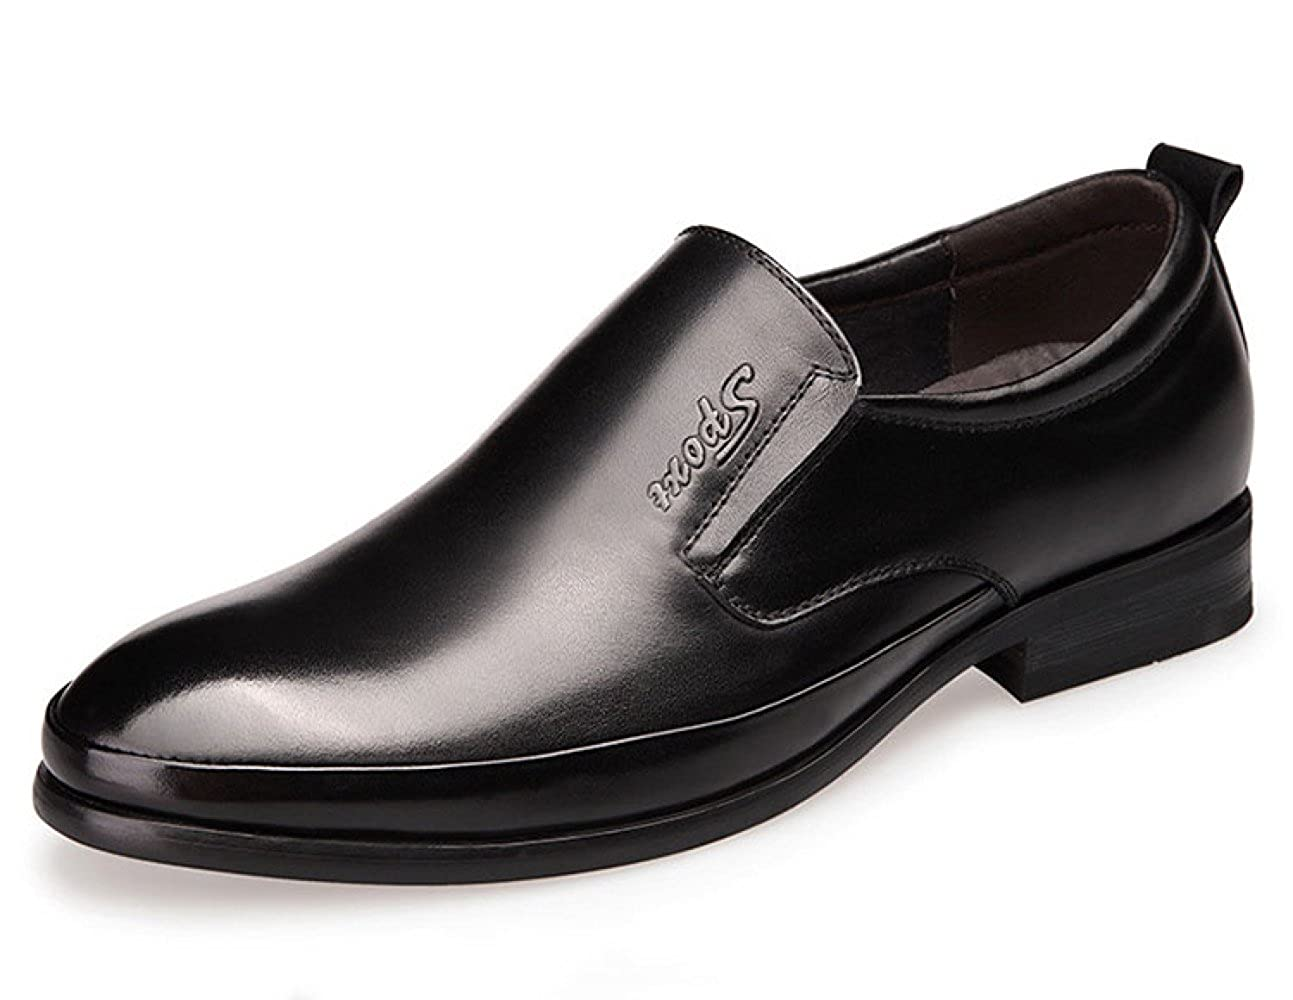 LEDLFIE Herren Lederschuhe Bequeme Breathable Geschäft Casual Herrenschuhe schwarz schwarz schwarz 984e6a